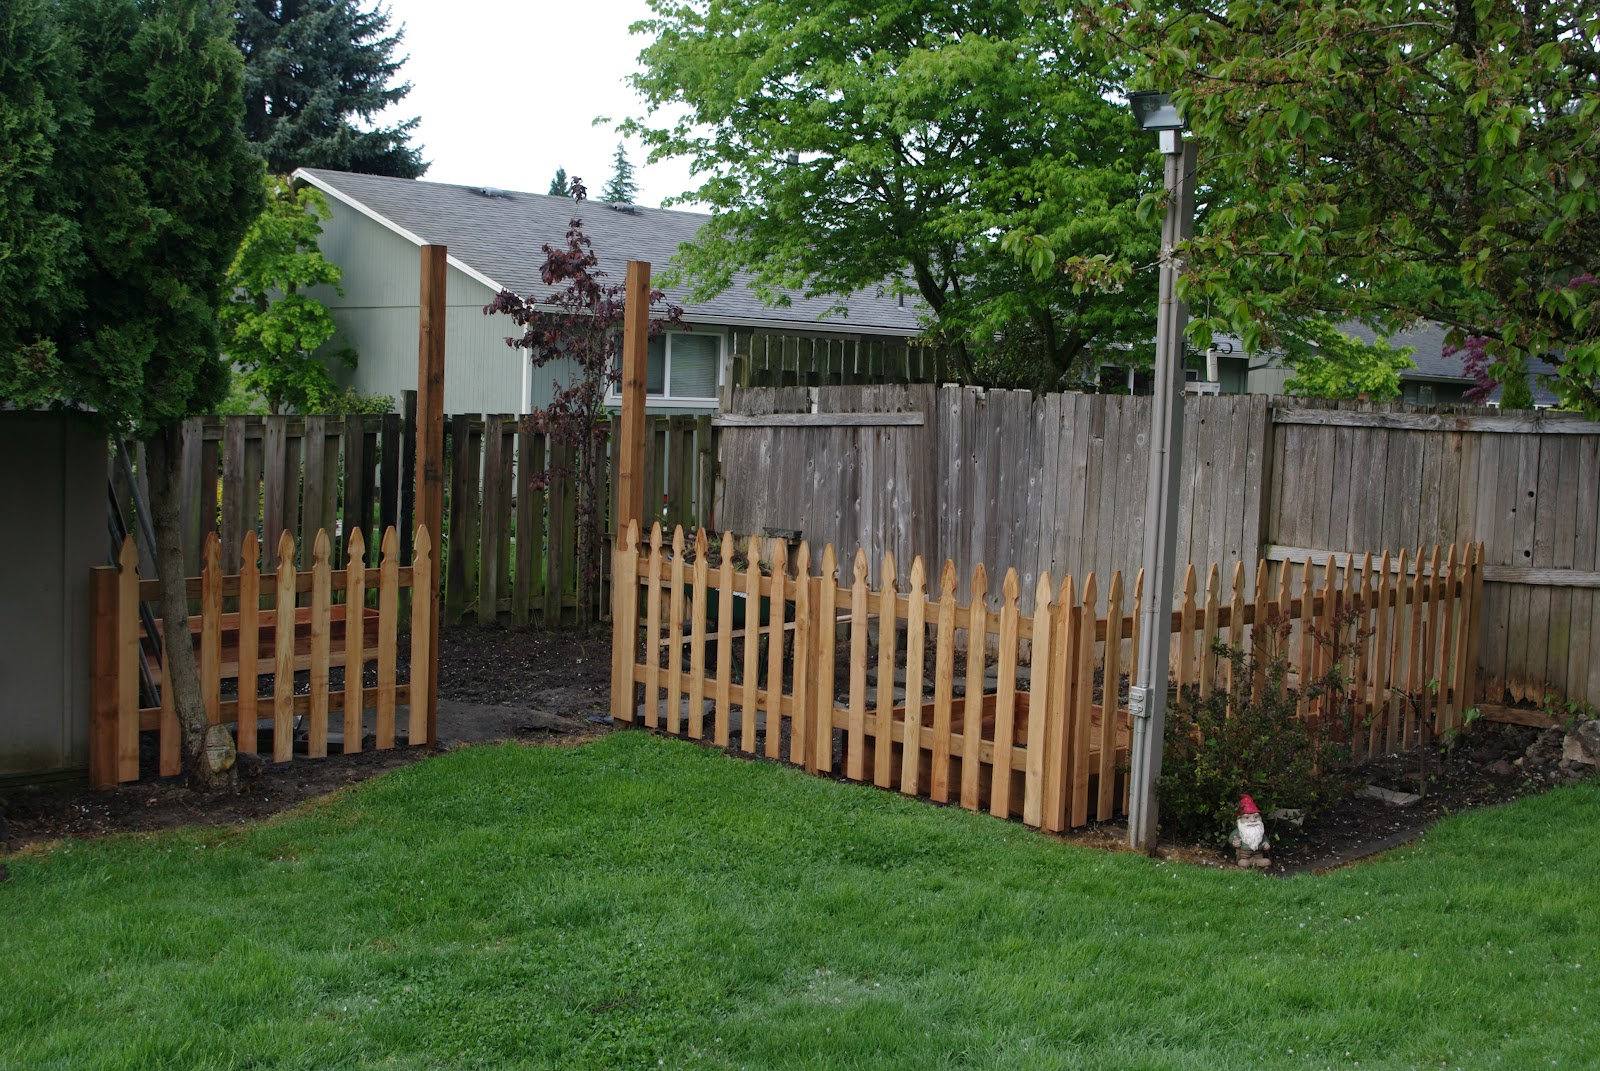 Homelifescience Backyard Garden Fence In Progress